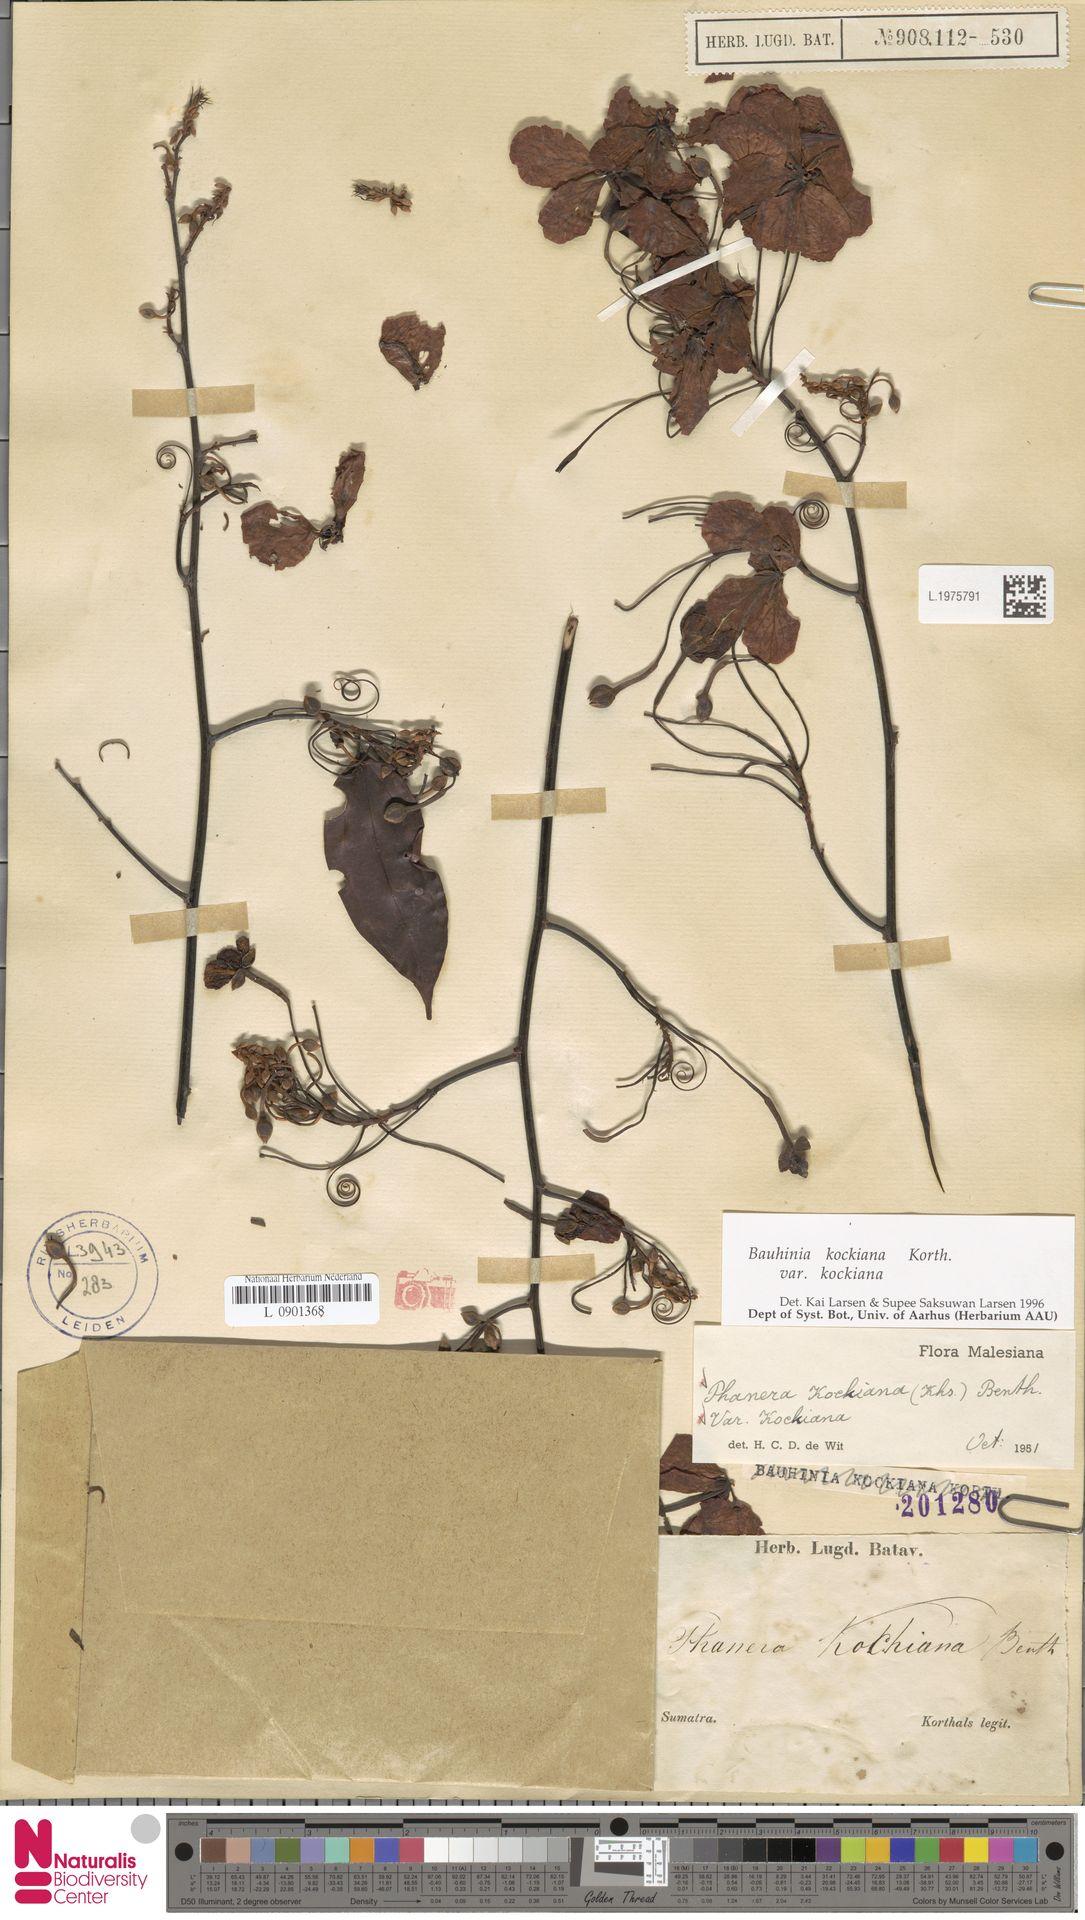 L.1975791 | Bauhinia kockiana var. kockiana